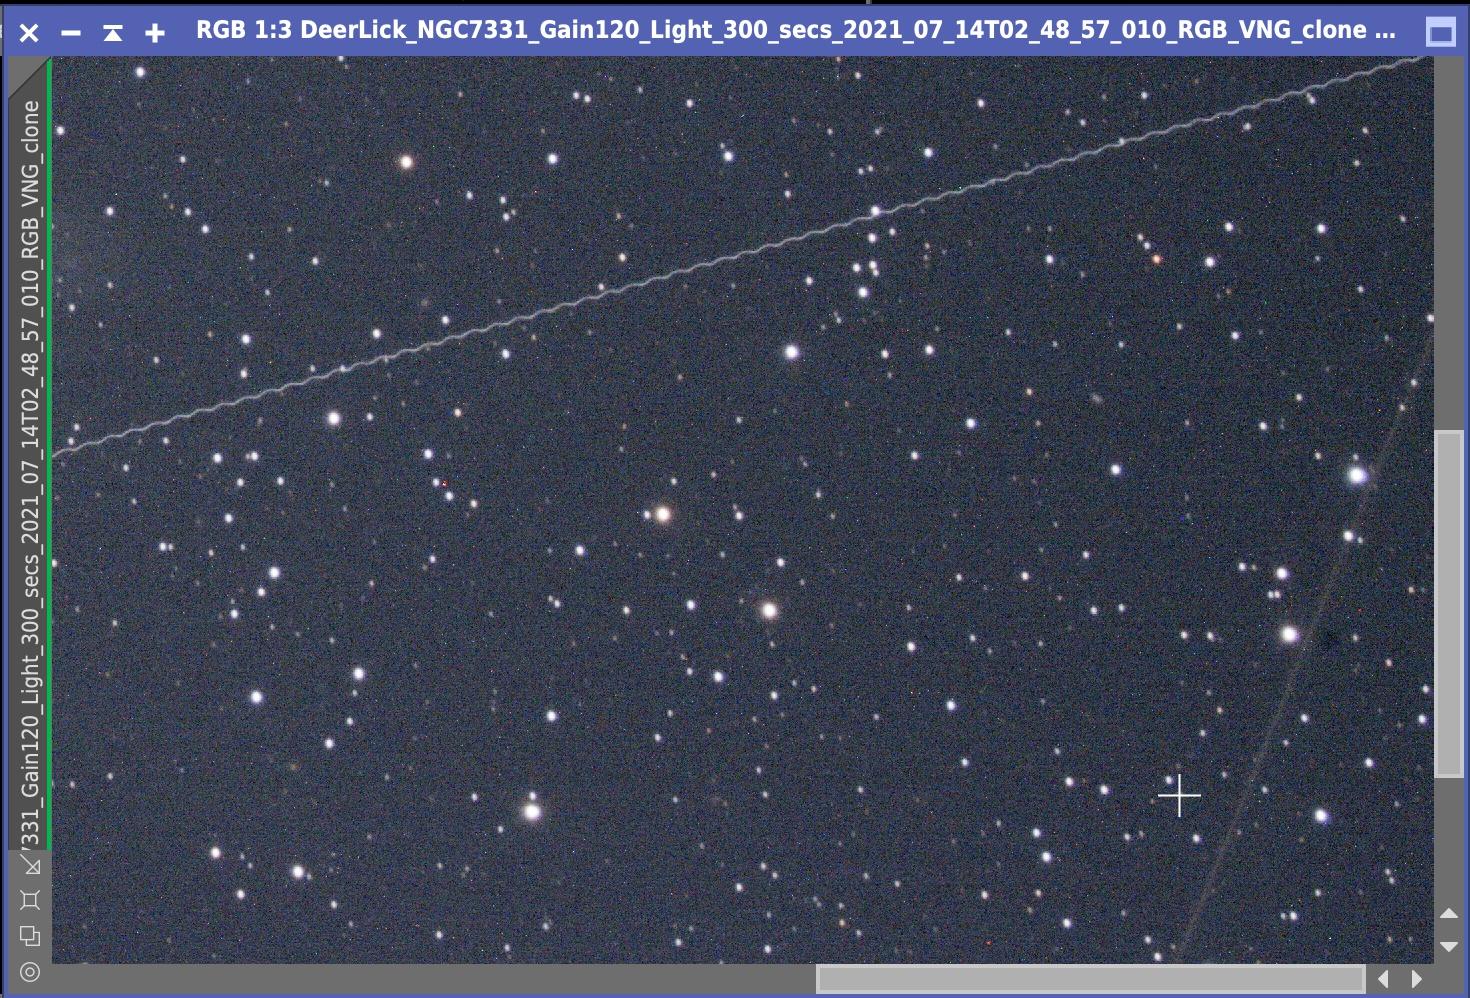 DeerLick_Wiggle_and_Straight_SatelliteTrails.jpg